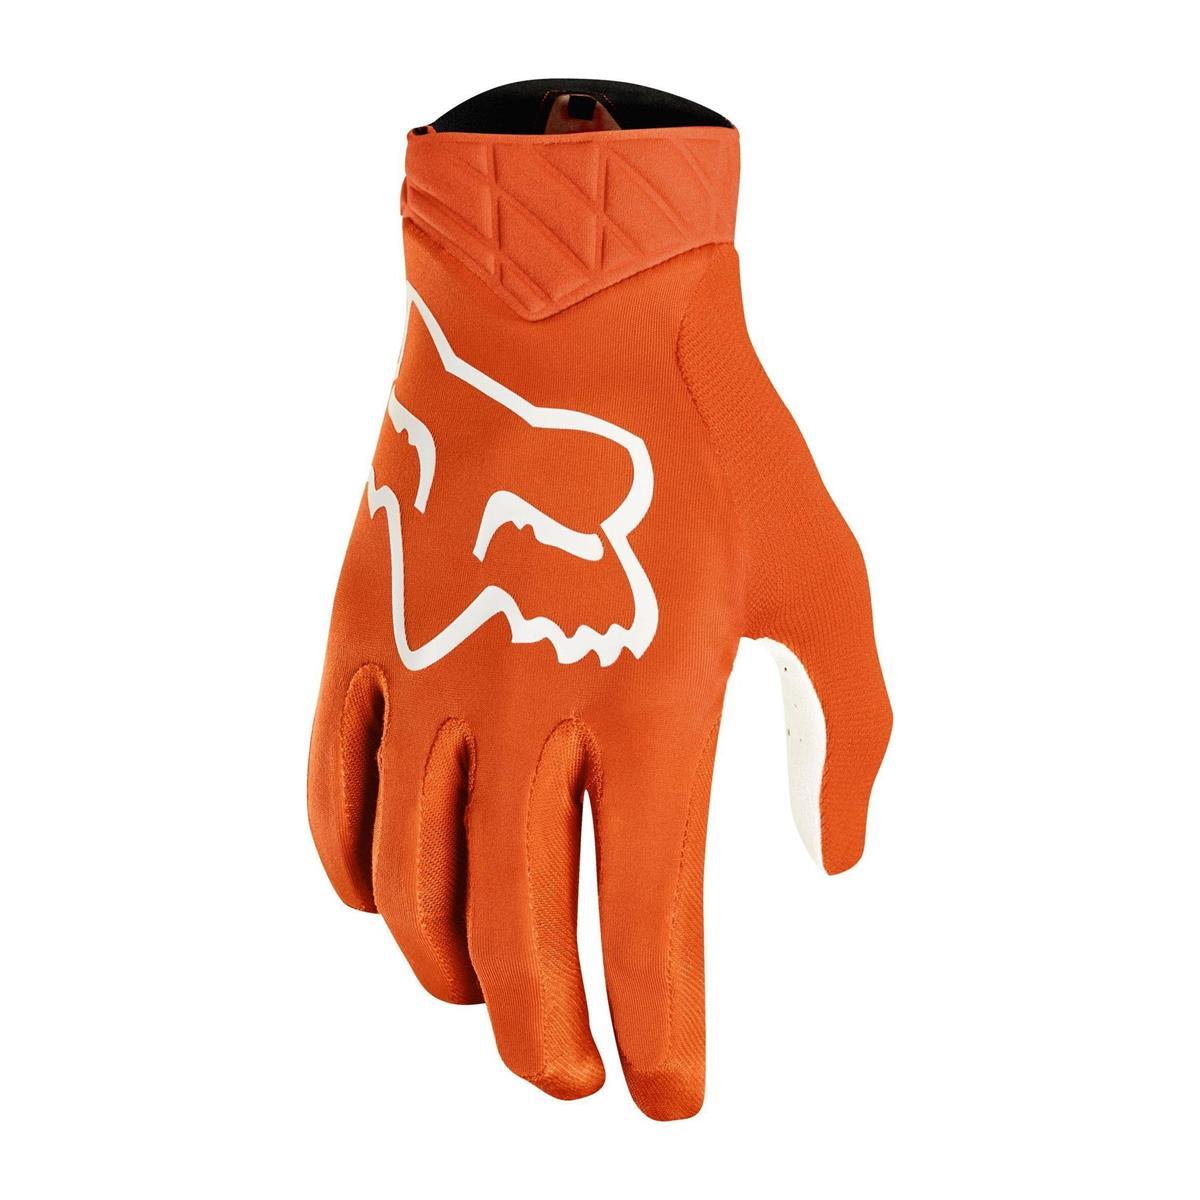 Fox Handschuhe Airline Orange